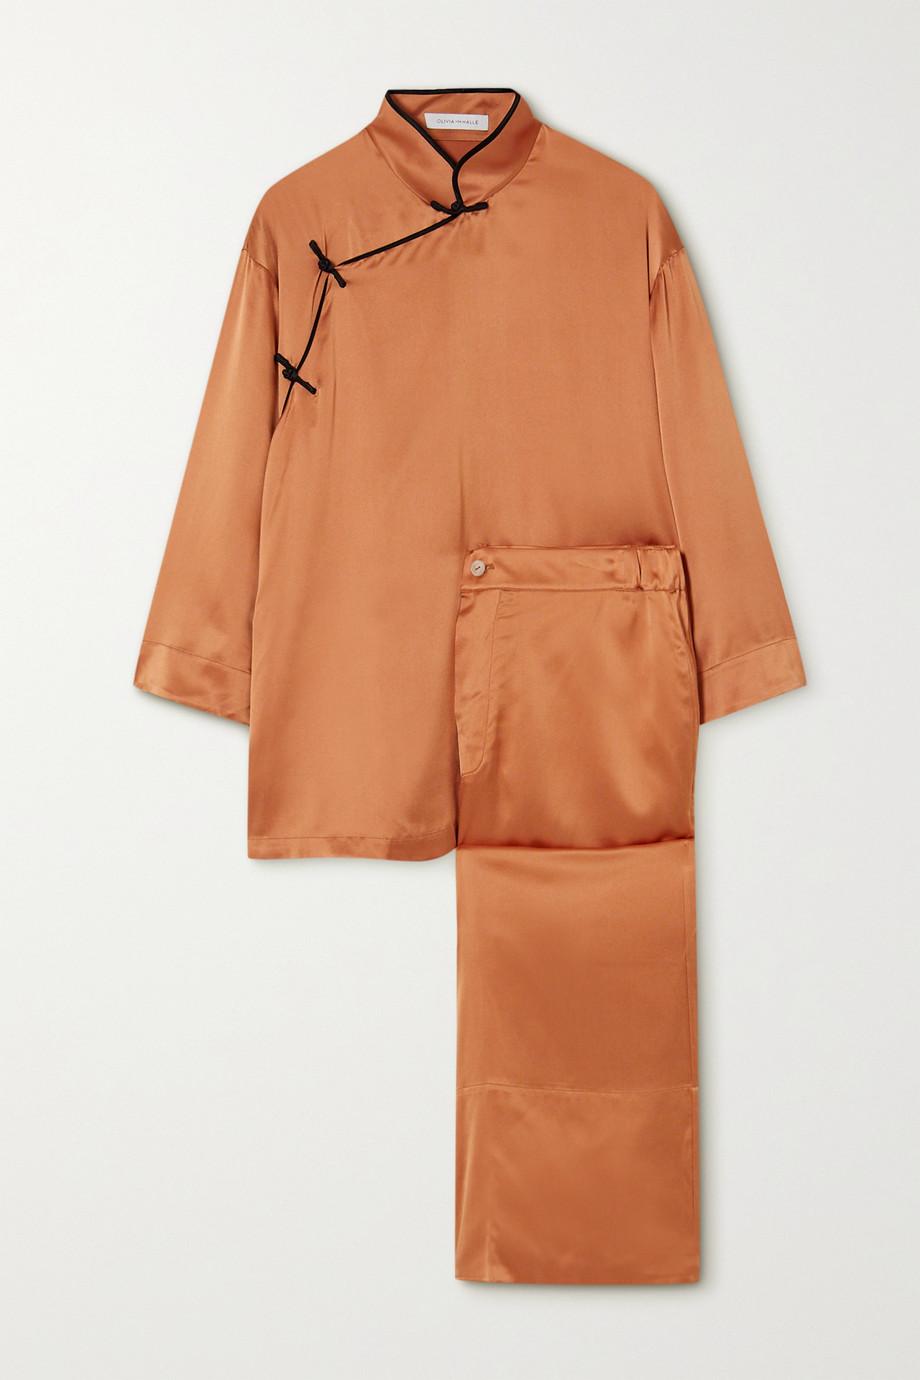 Olivia von Halle Harlow silk-satin pajama set